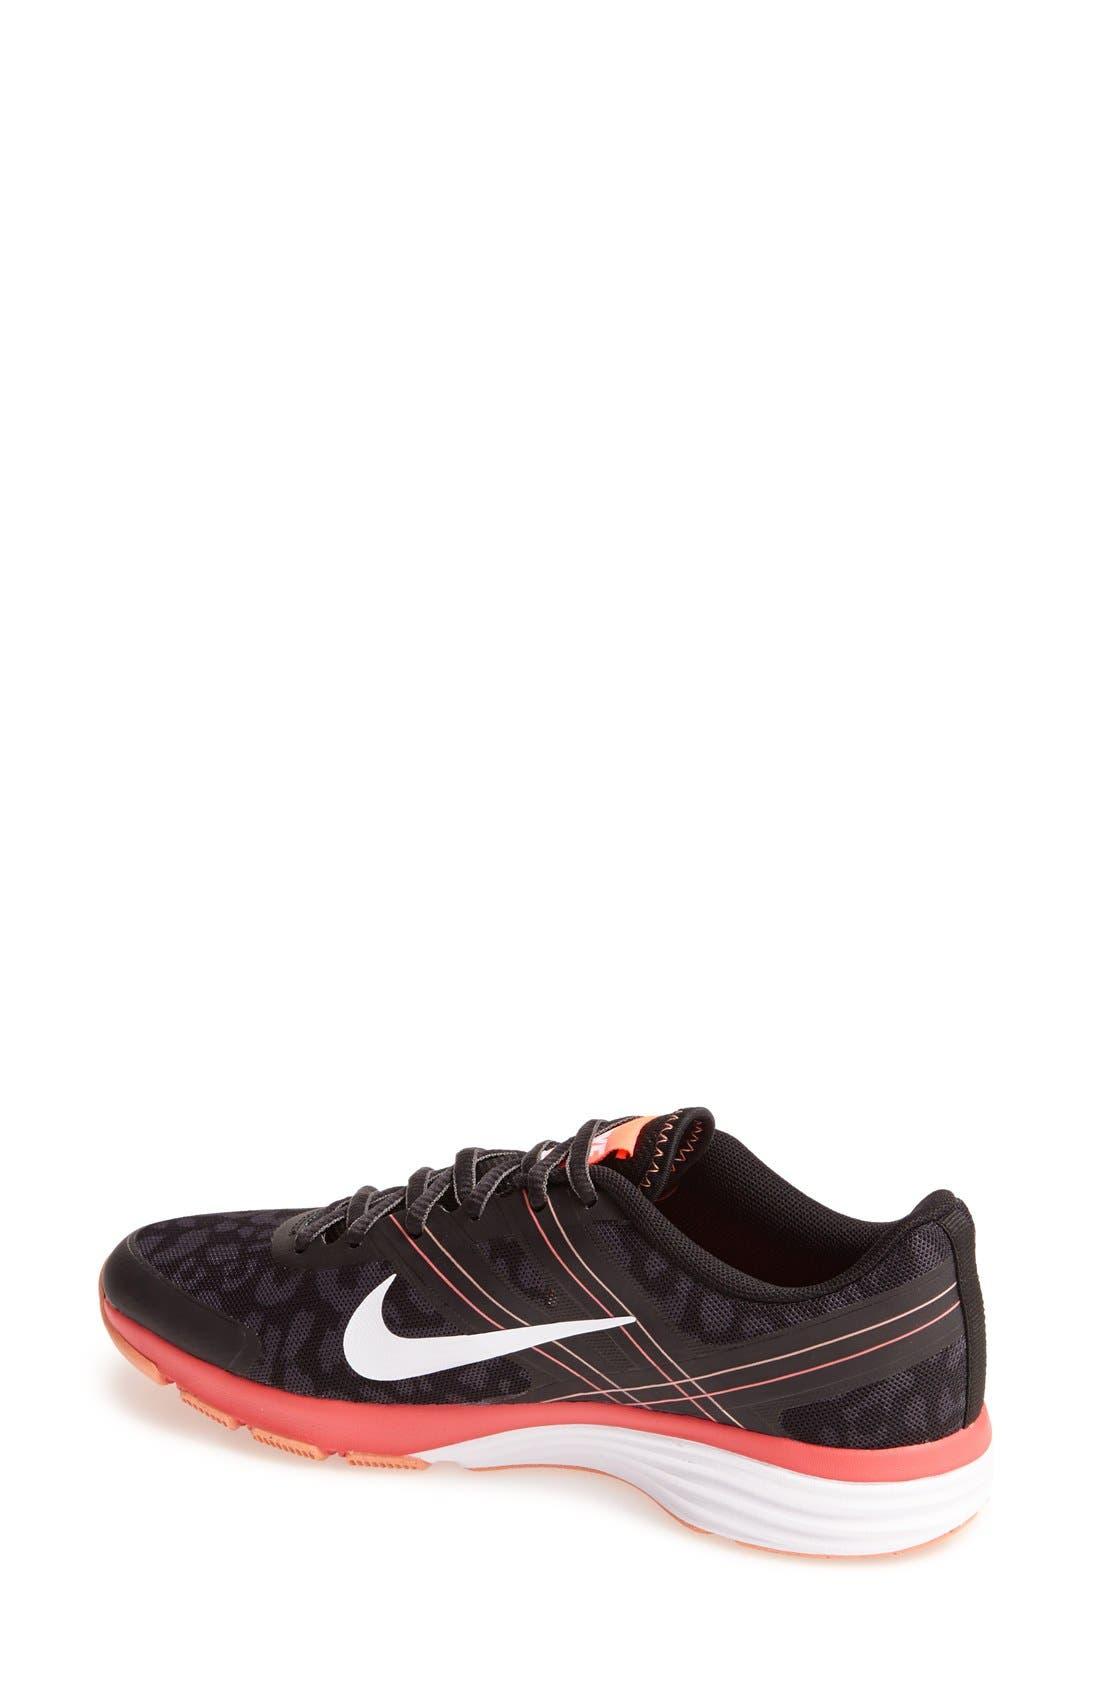 Alternate Image 2  - Nike 'Dual Fusion TR II' Training Shoe (Women)